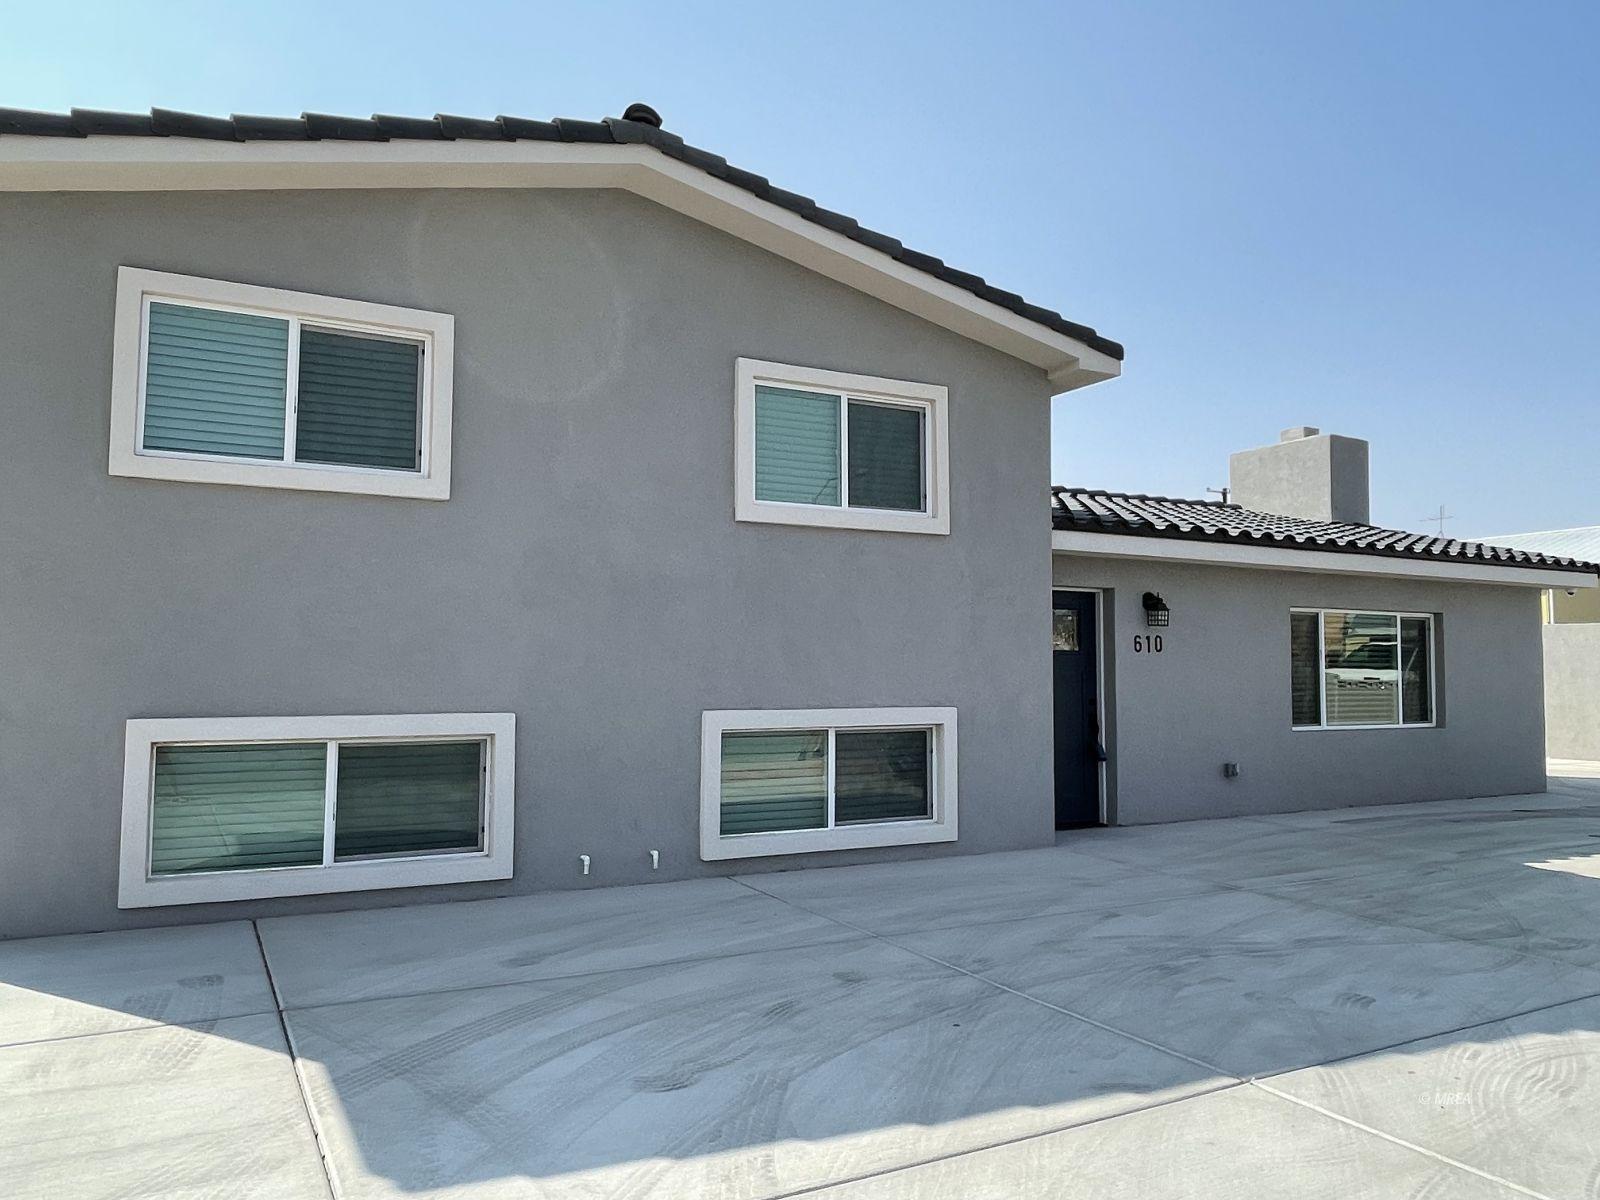 610 W Mesquite Blvd, Mesquite NV 89027